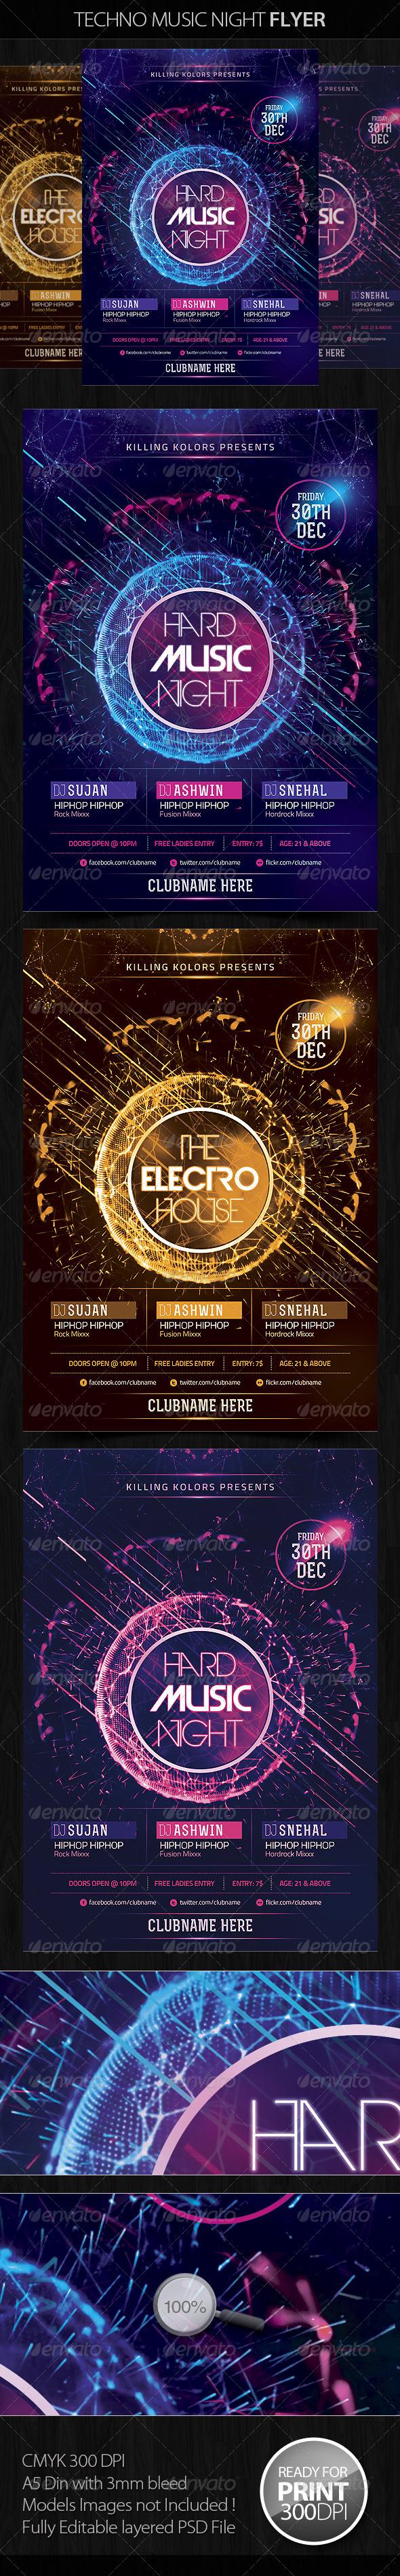 Techno Music Night Flyer